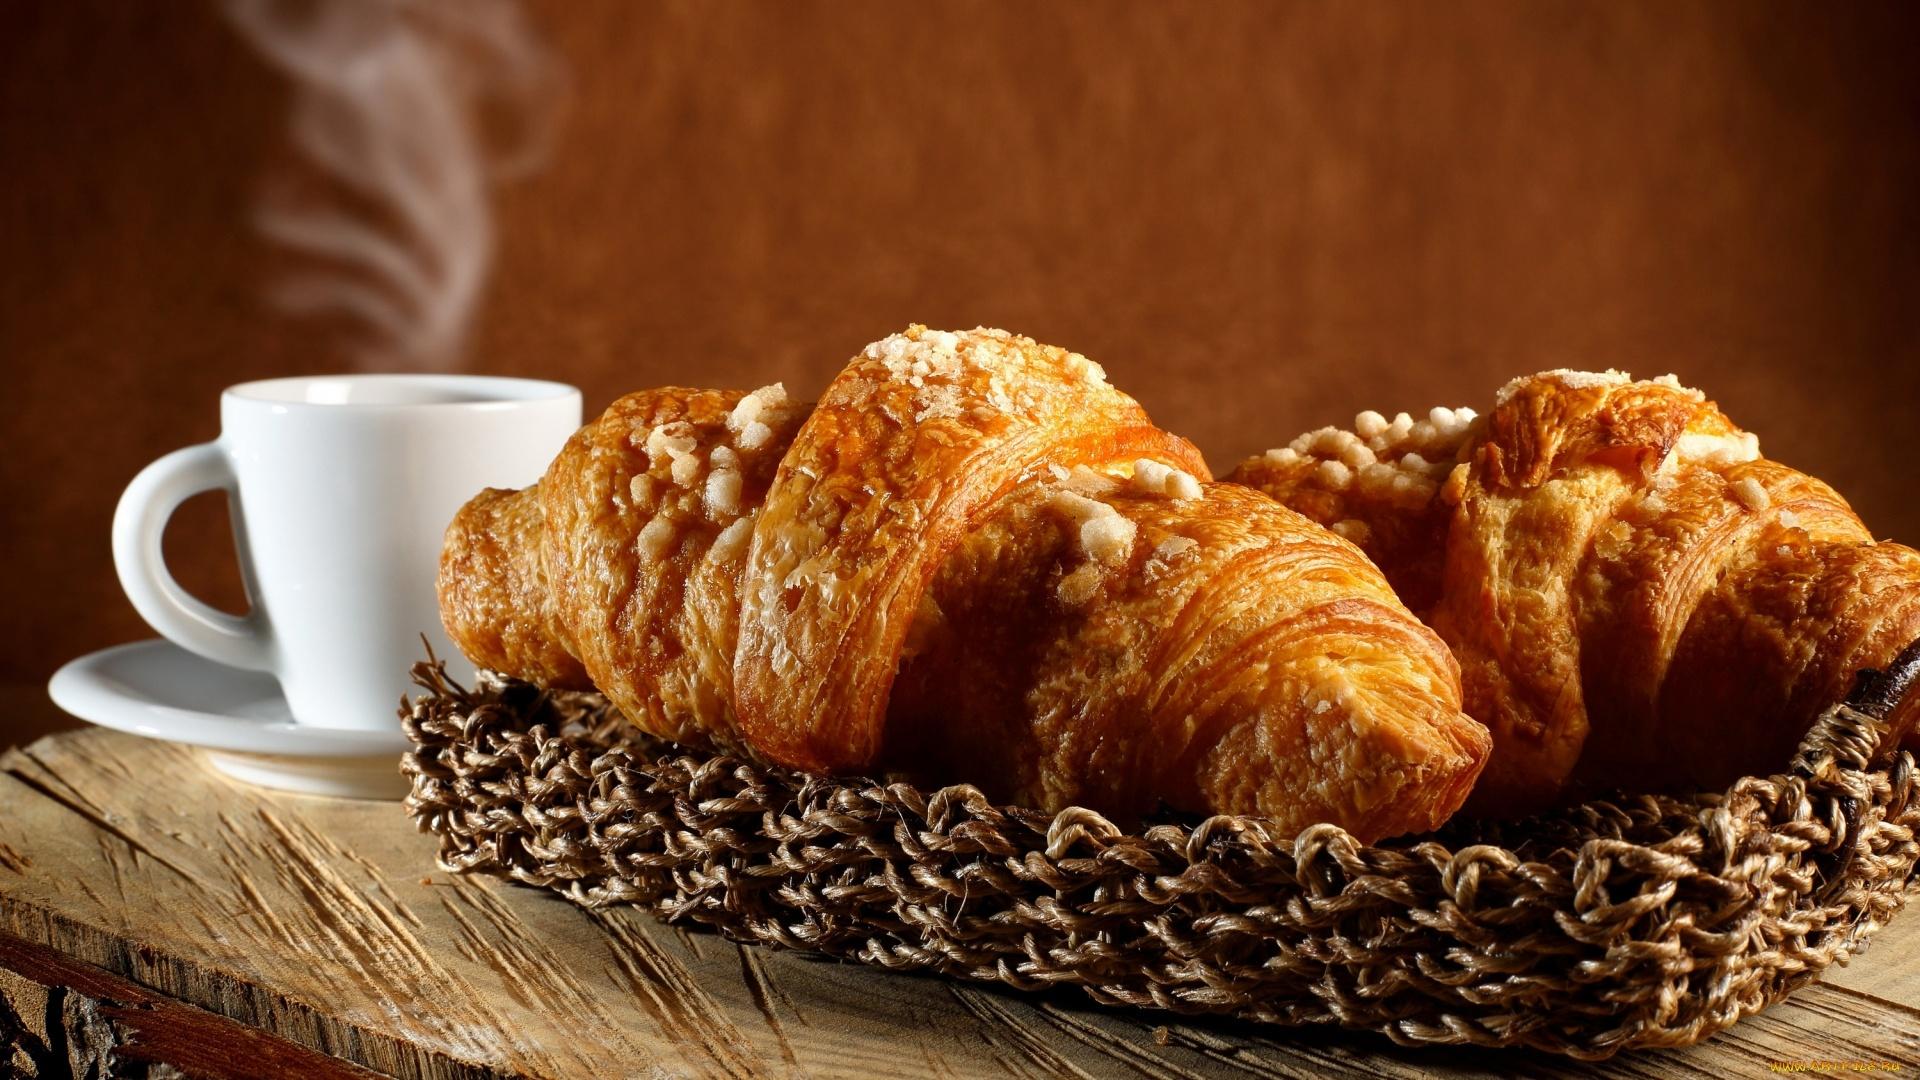 Croissants HD Wallpaper